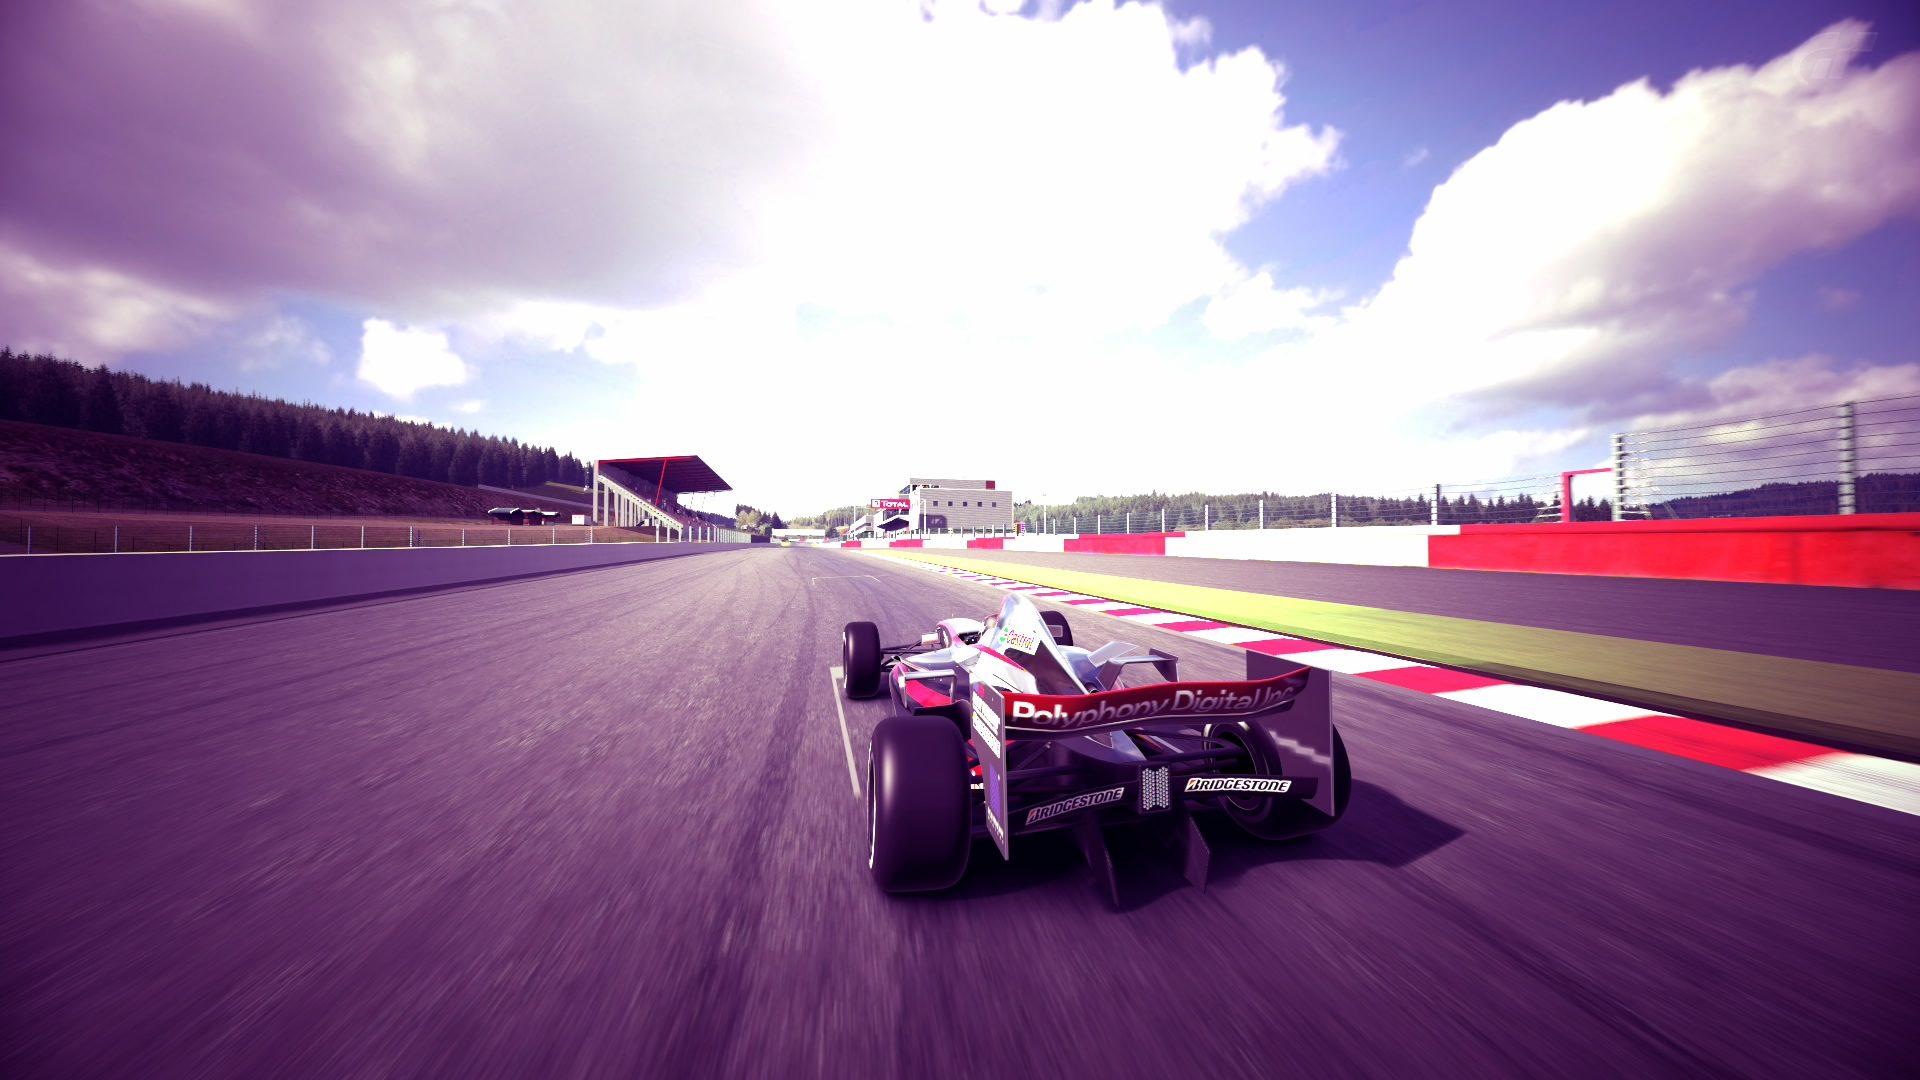 Circuit de Spa-Francorchamps_31 (2).jpg